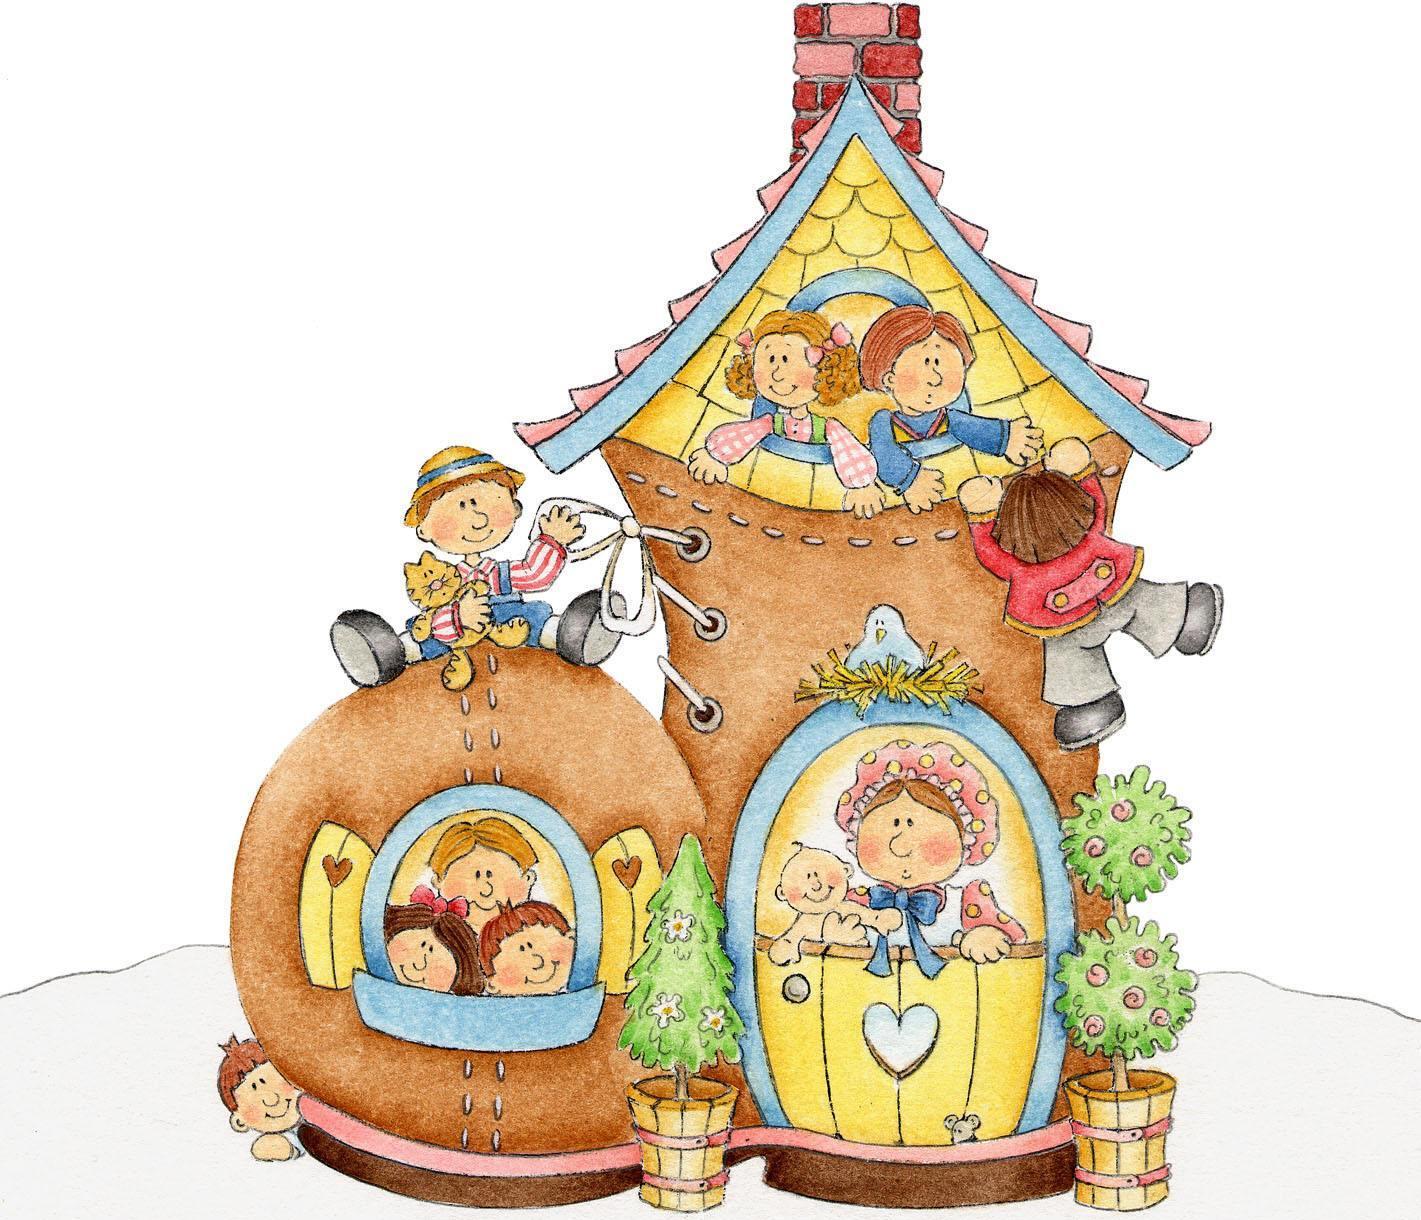 Humpty dumpty clipart anaphora. Nursery rhyme buy hickory